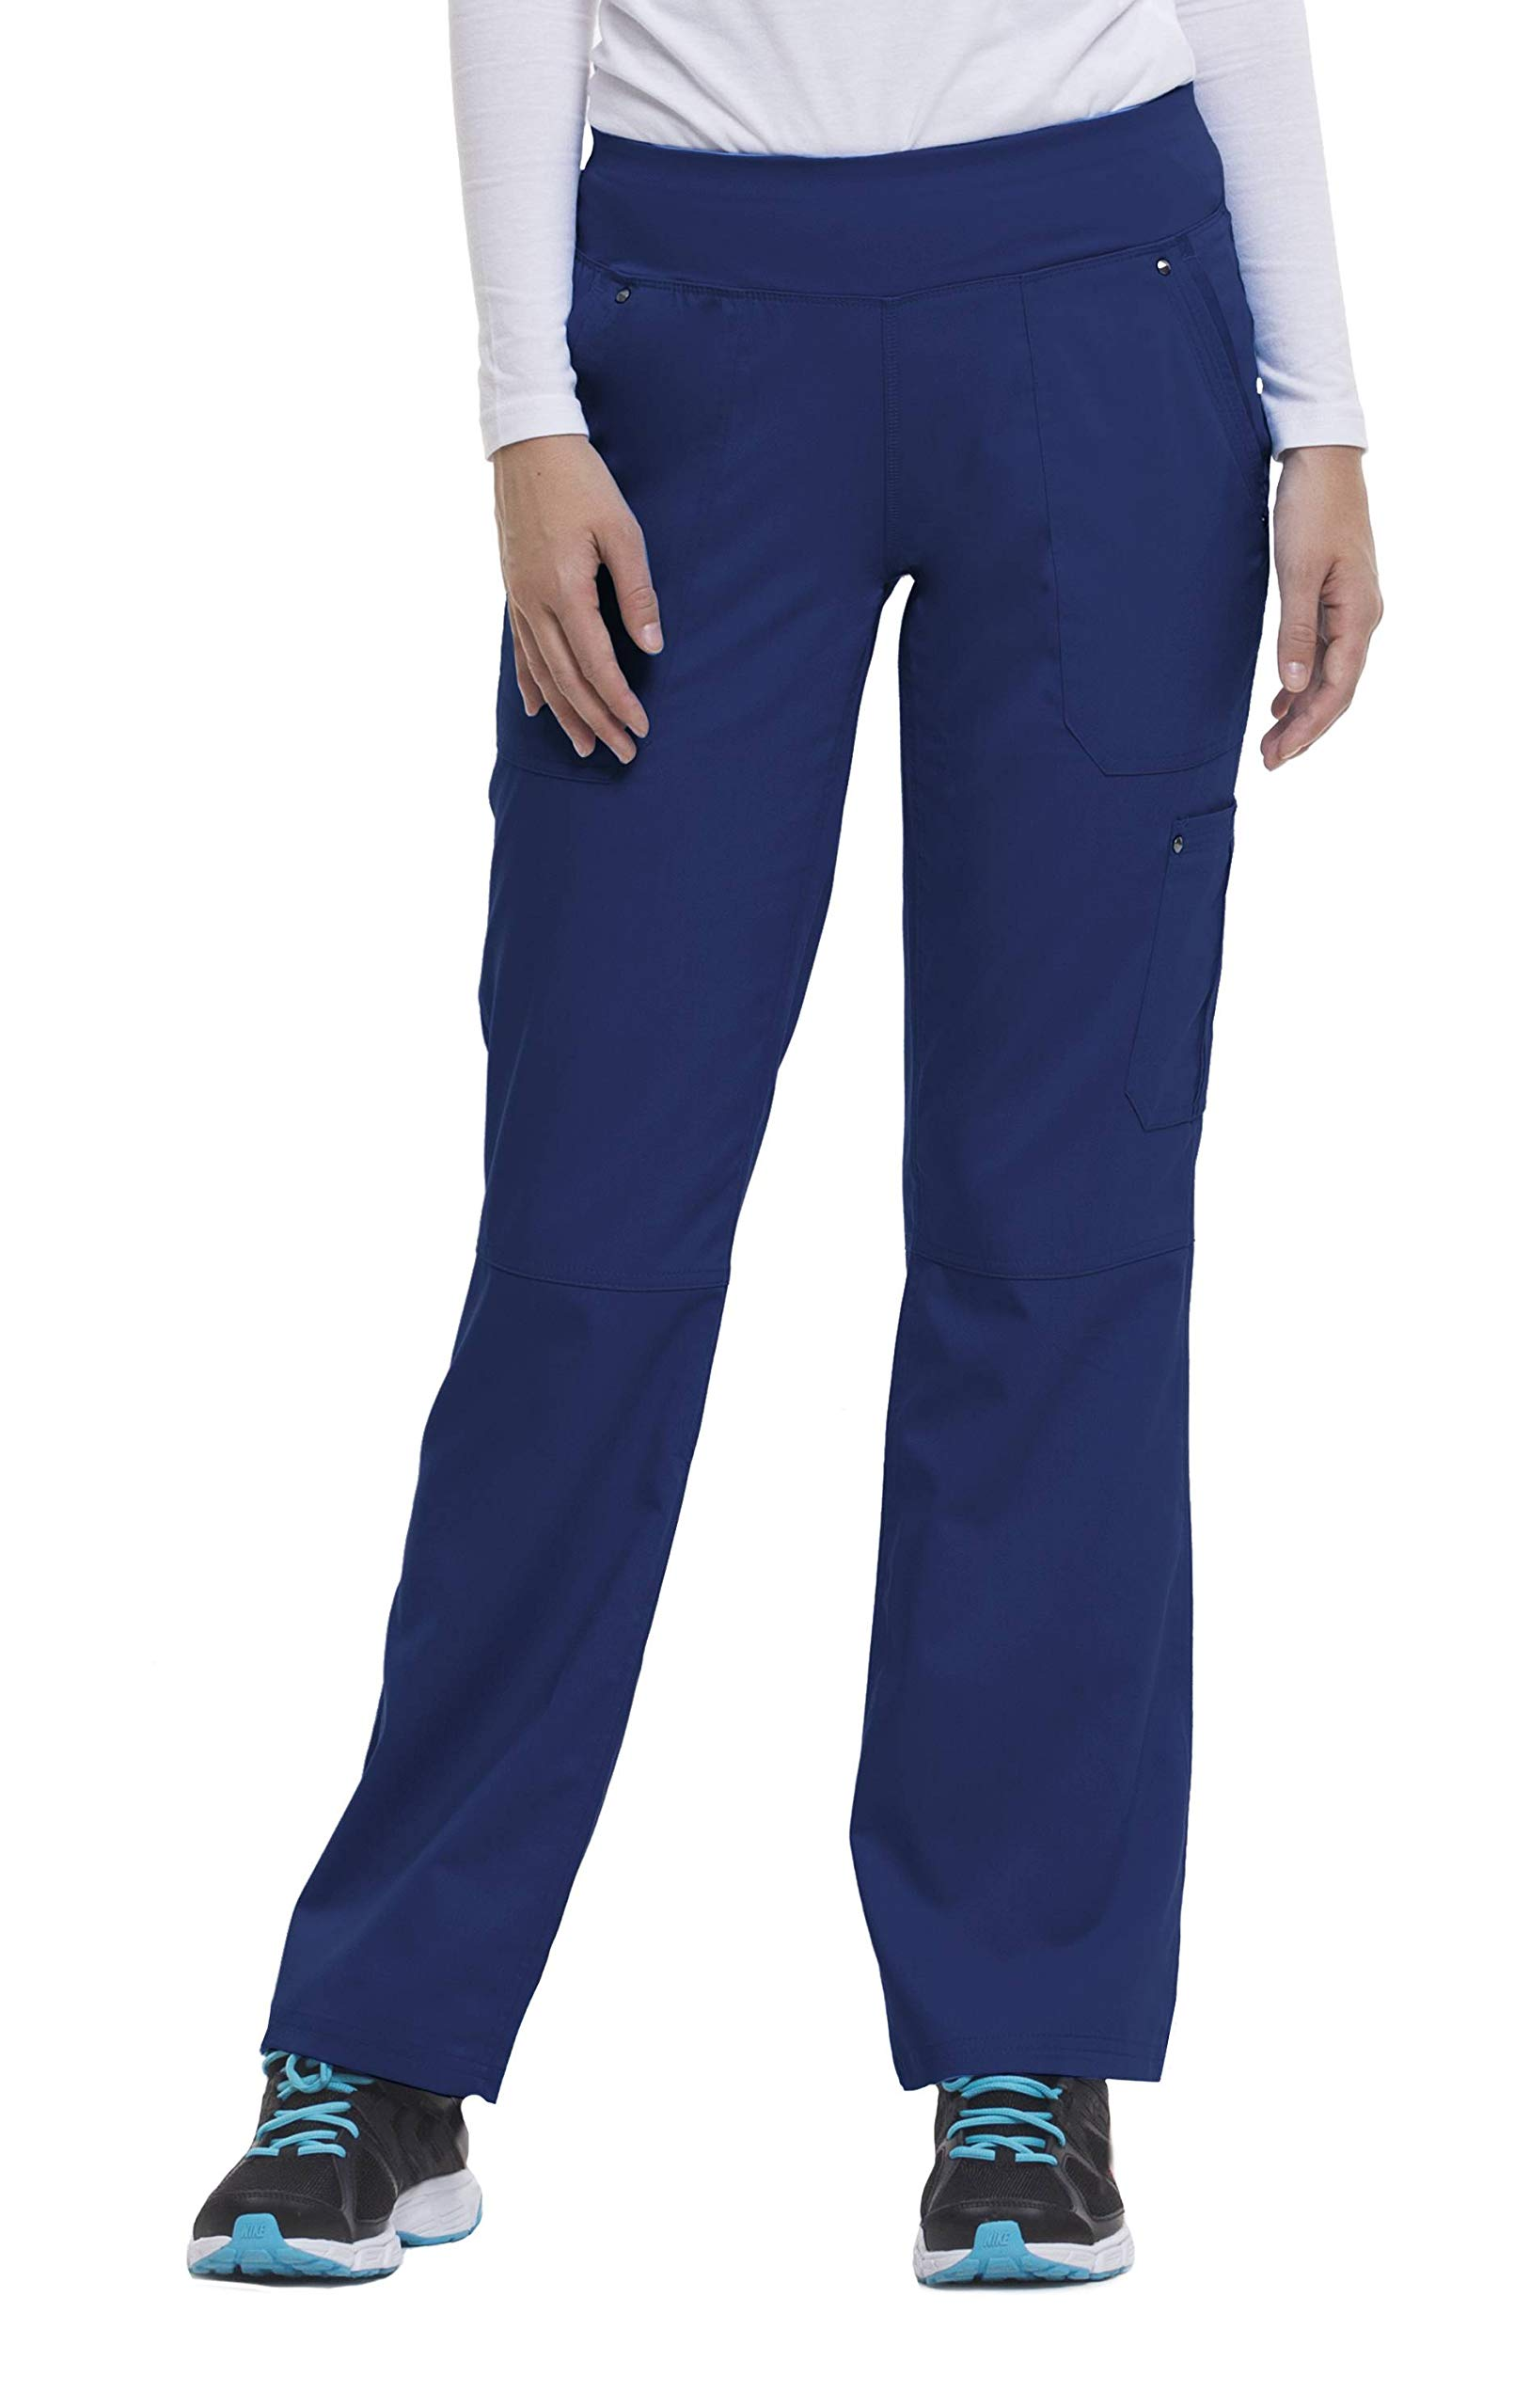 healing hands Purple Label Yoga Women's Tori 9133 5 Pocket Knit Waist Pant Navy-XX-Large Tall